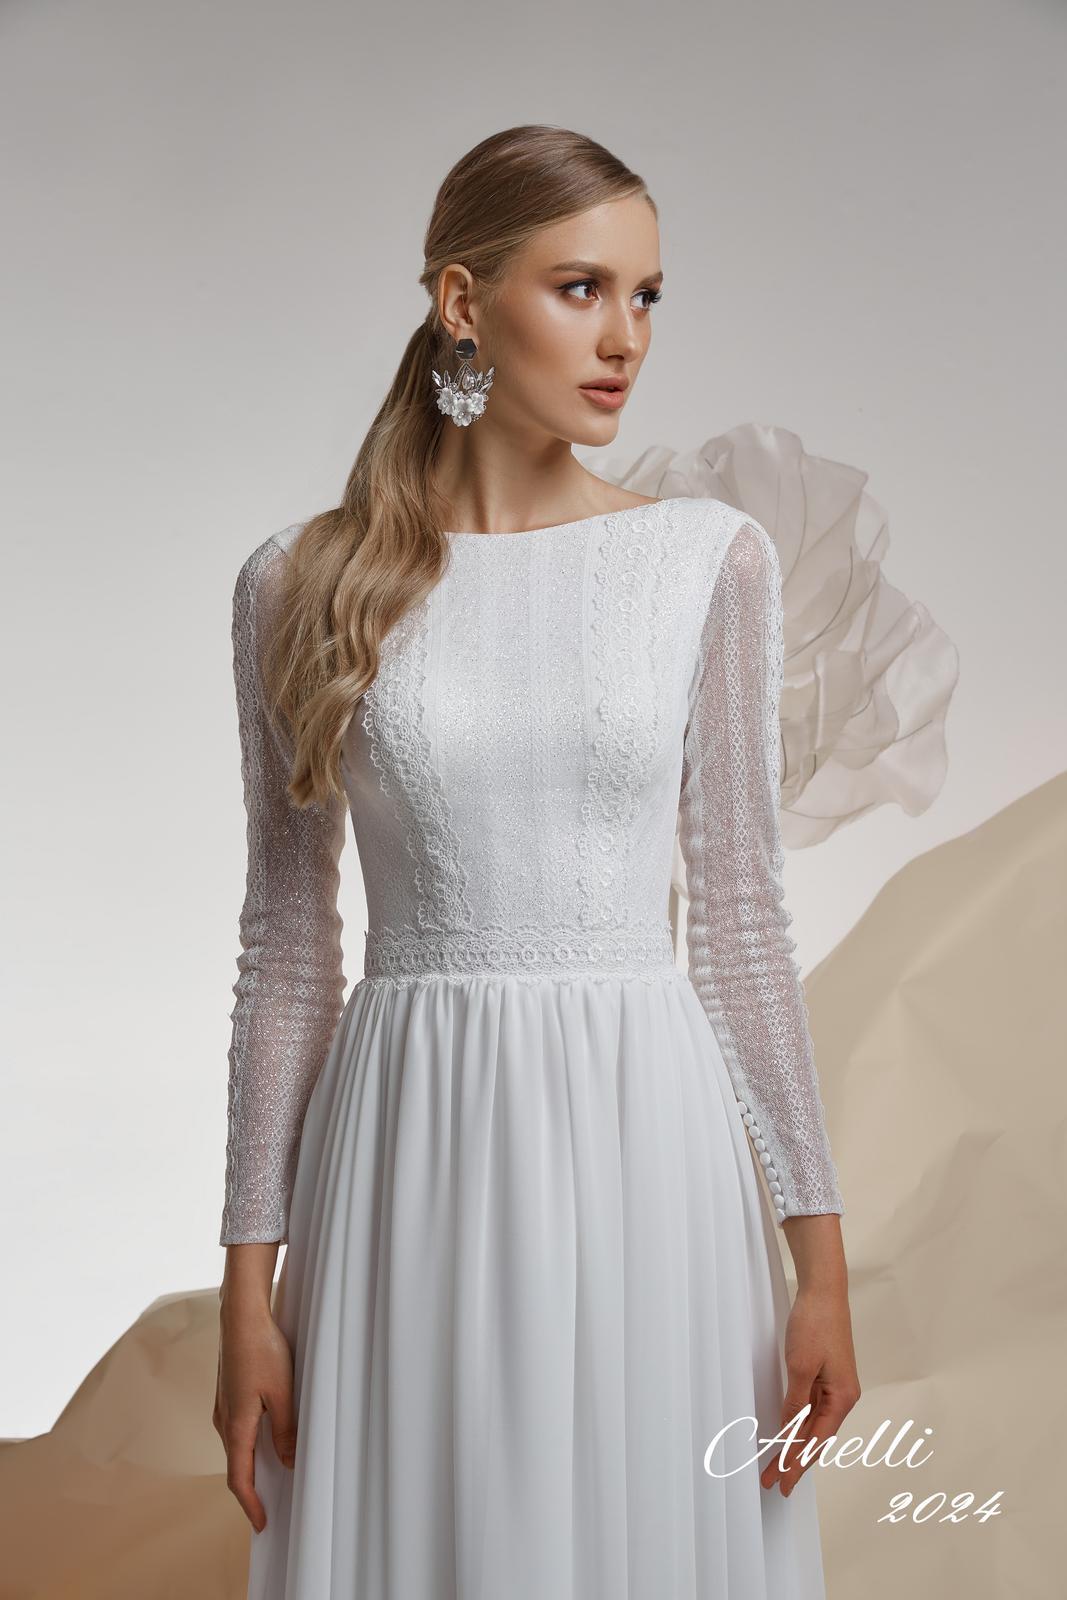 Svadobné šaty - Imagine 2024 - Obrázok č. 2